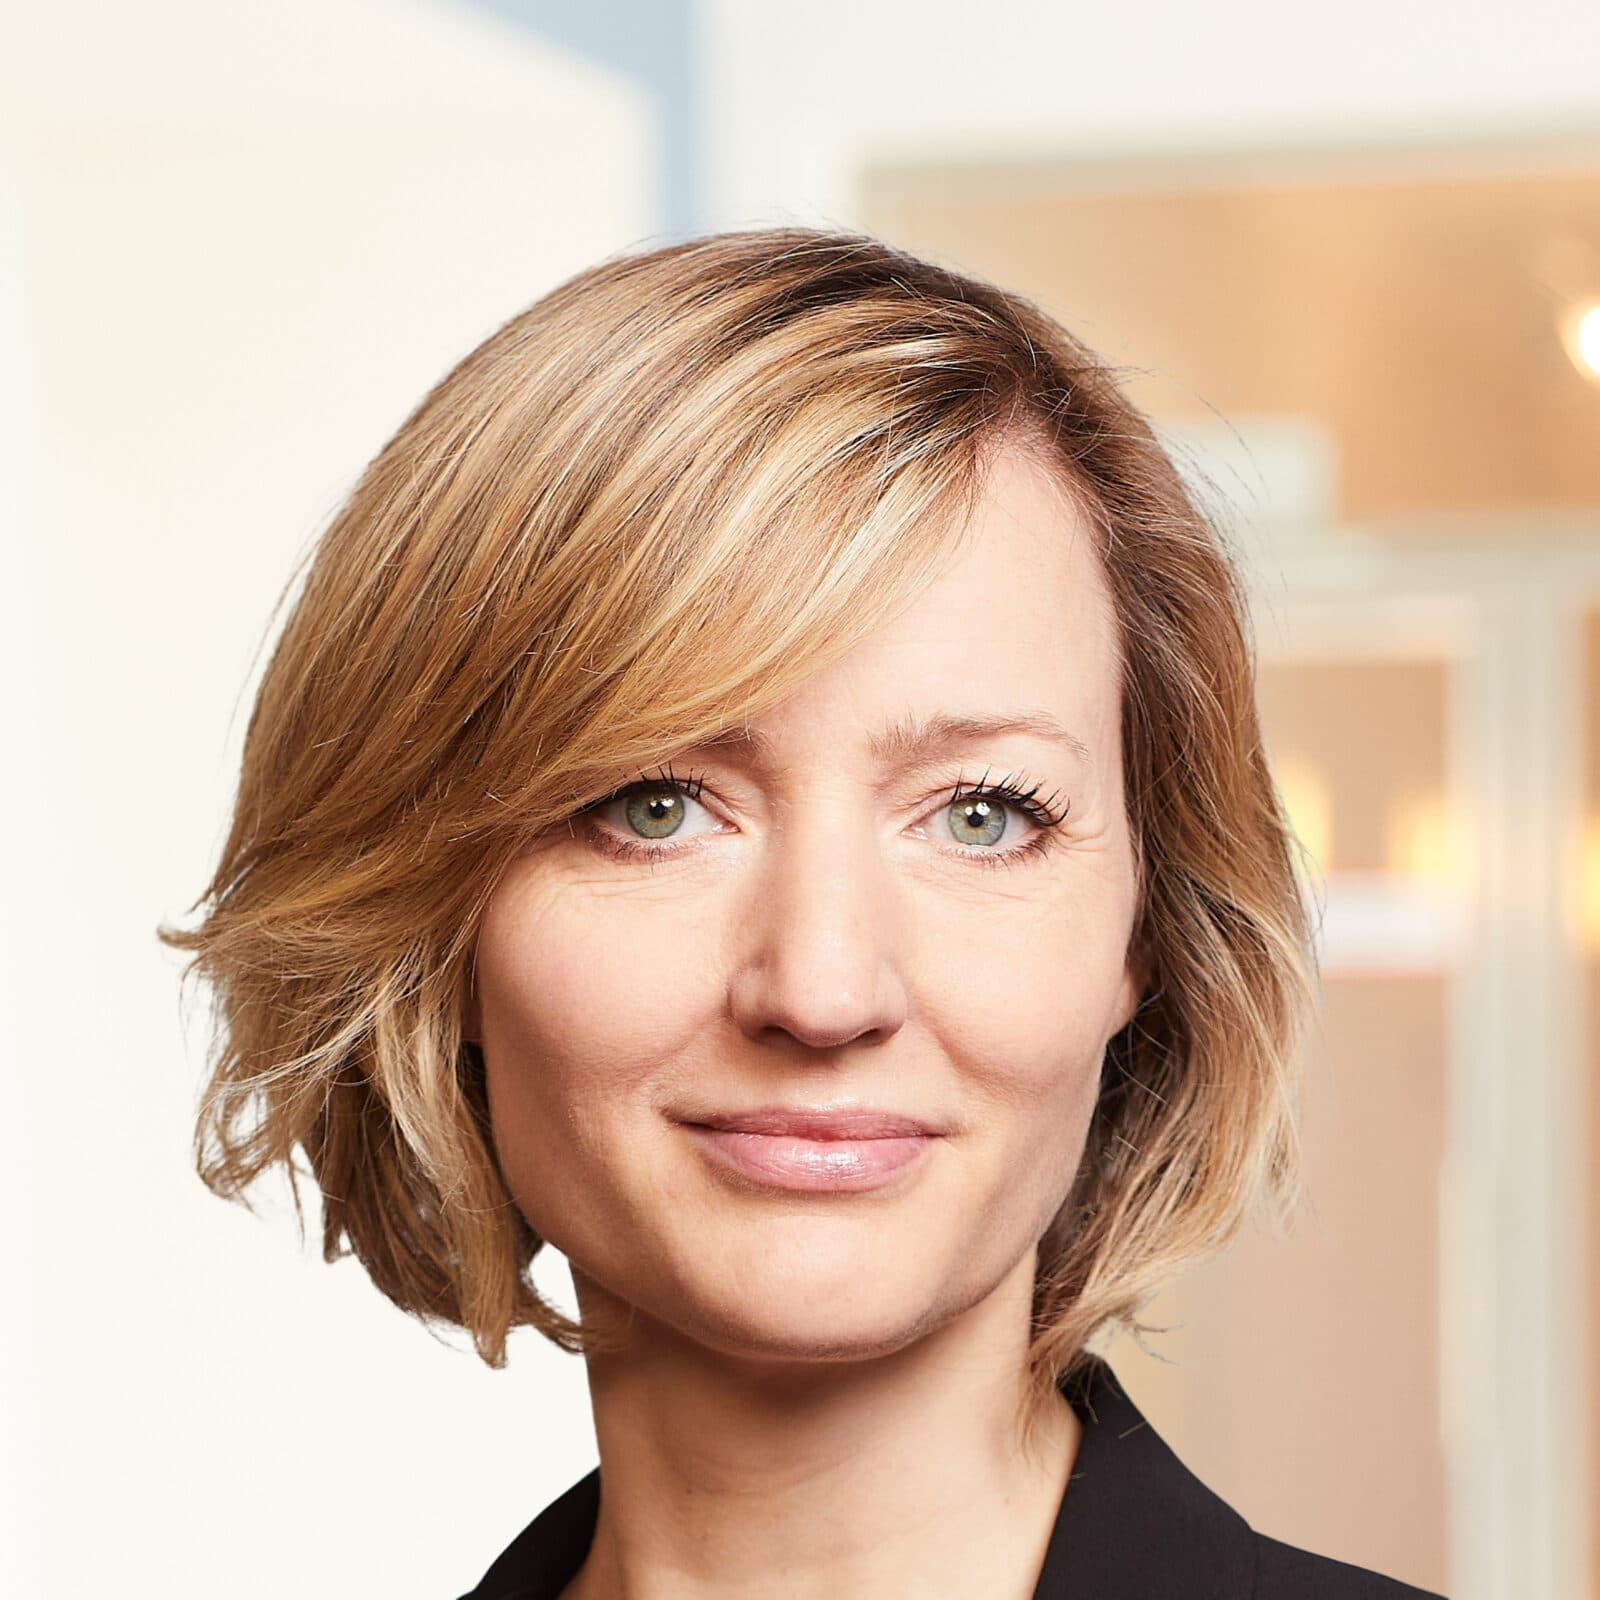 JProf. Iris Schneider, PhD